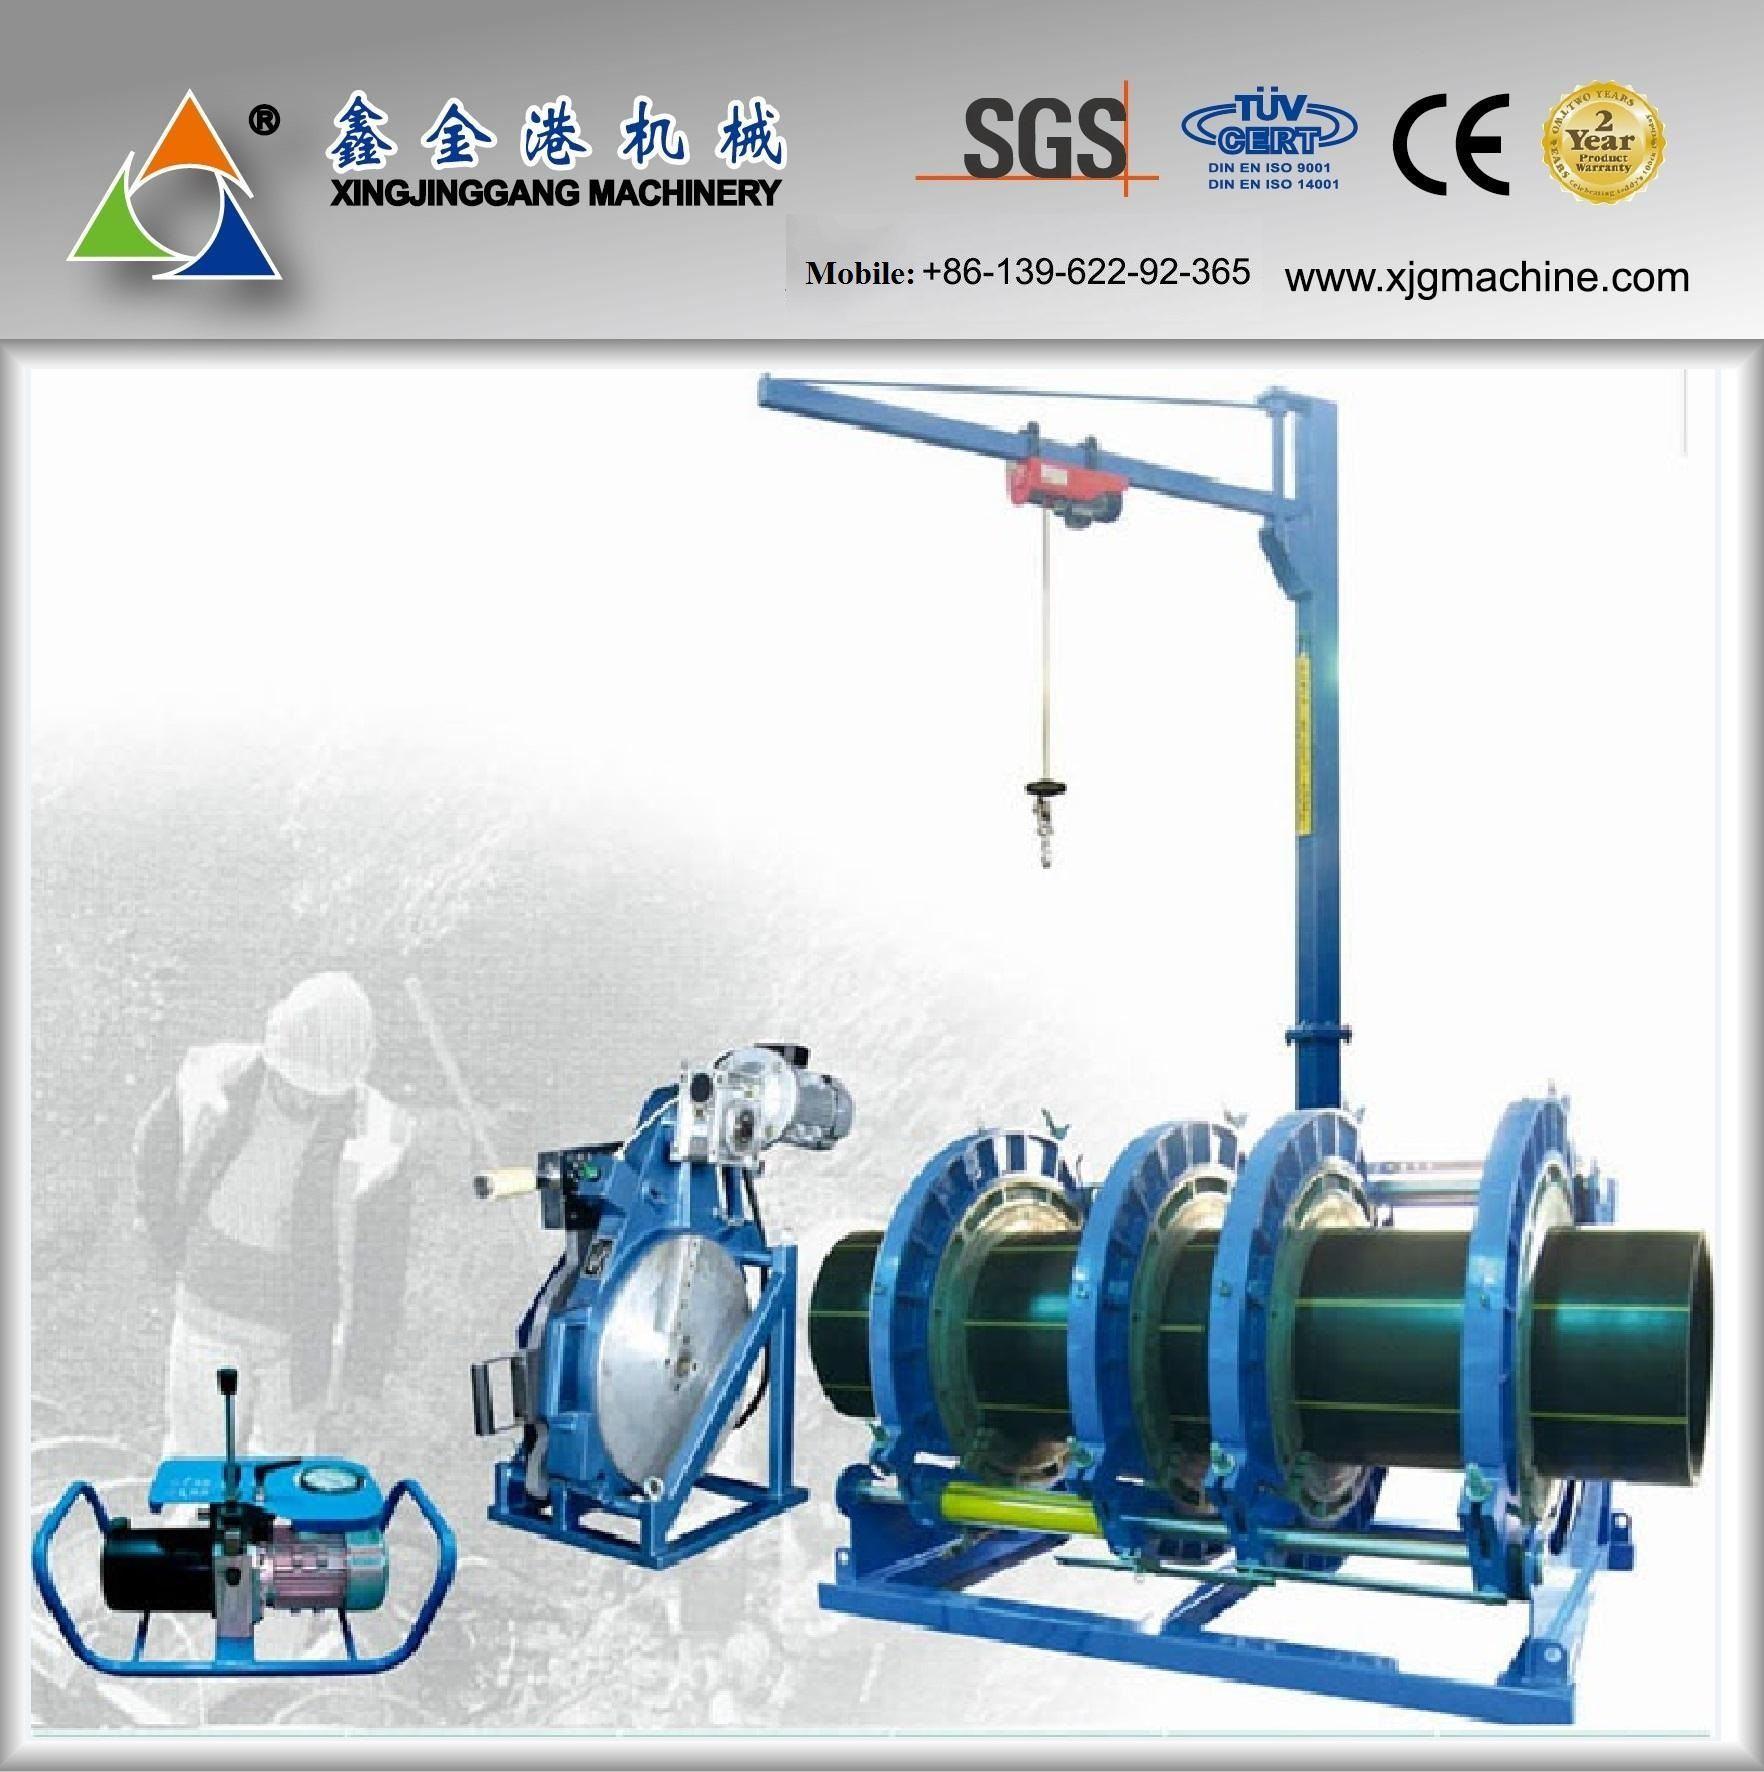 HDPE Pipe Welding Machine/HDPE Pipe Fusion Machine/HDPE Pipe Jointing Machine/HDPE Butt Welding Machine/HDPE Pipe Jointing Machine/HDPE Butt Fusion Machine